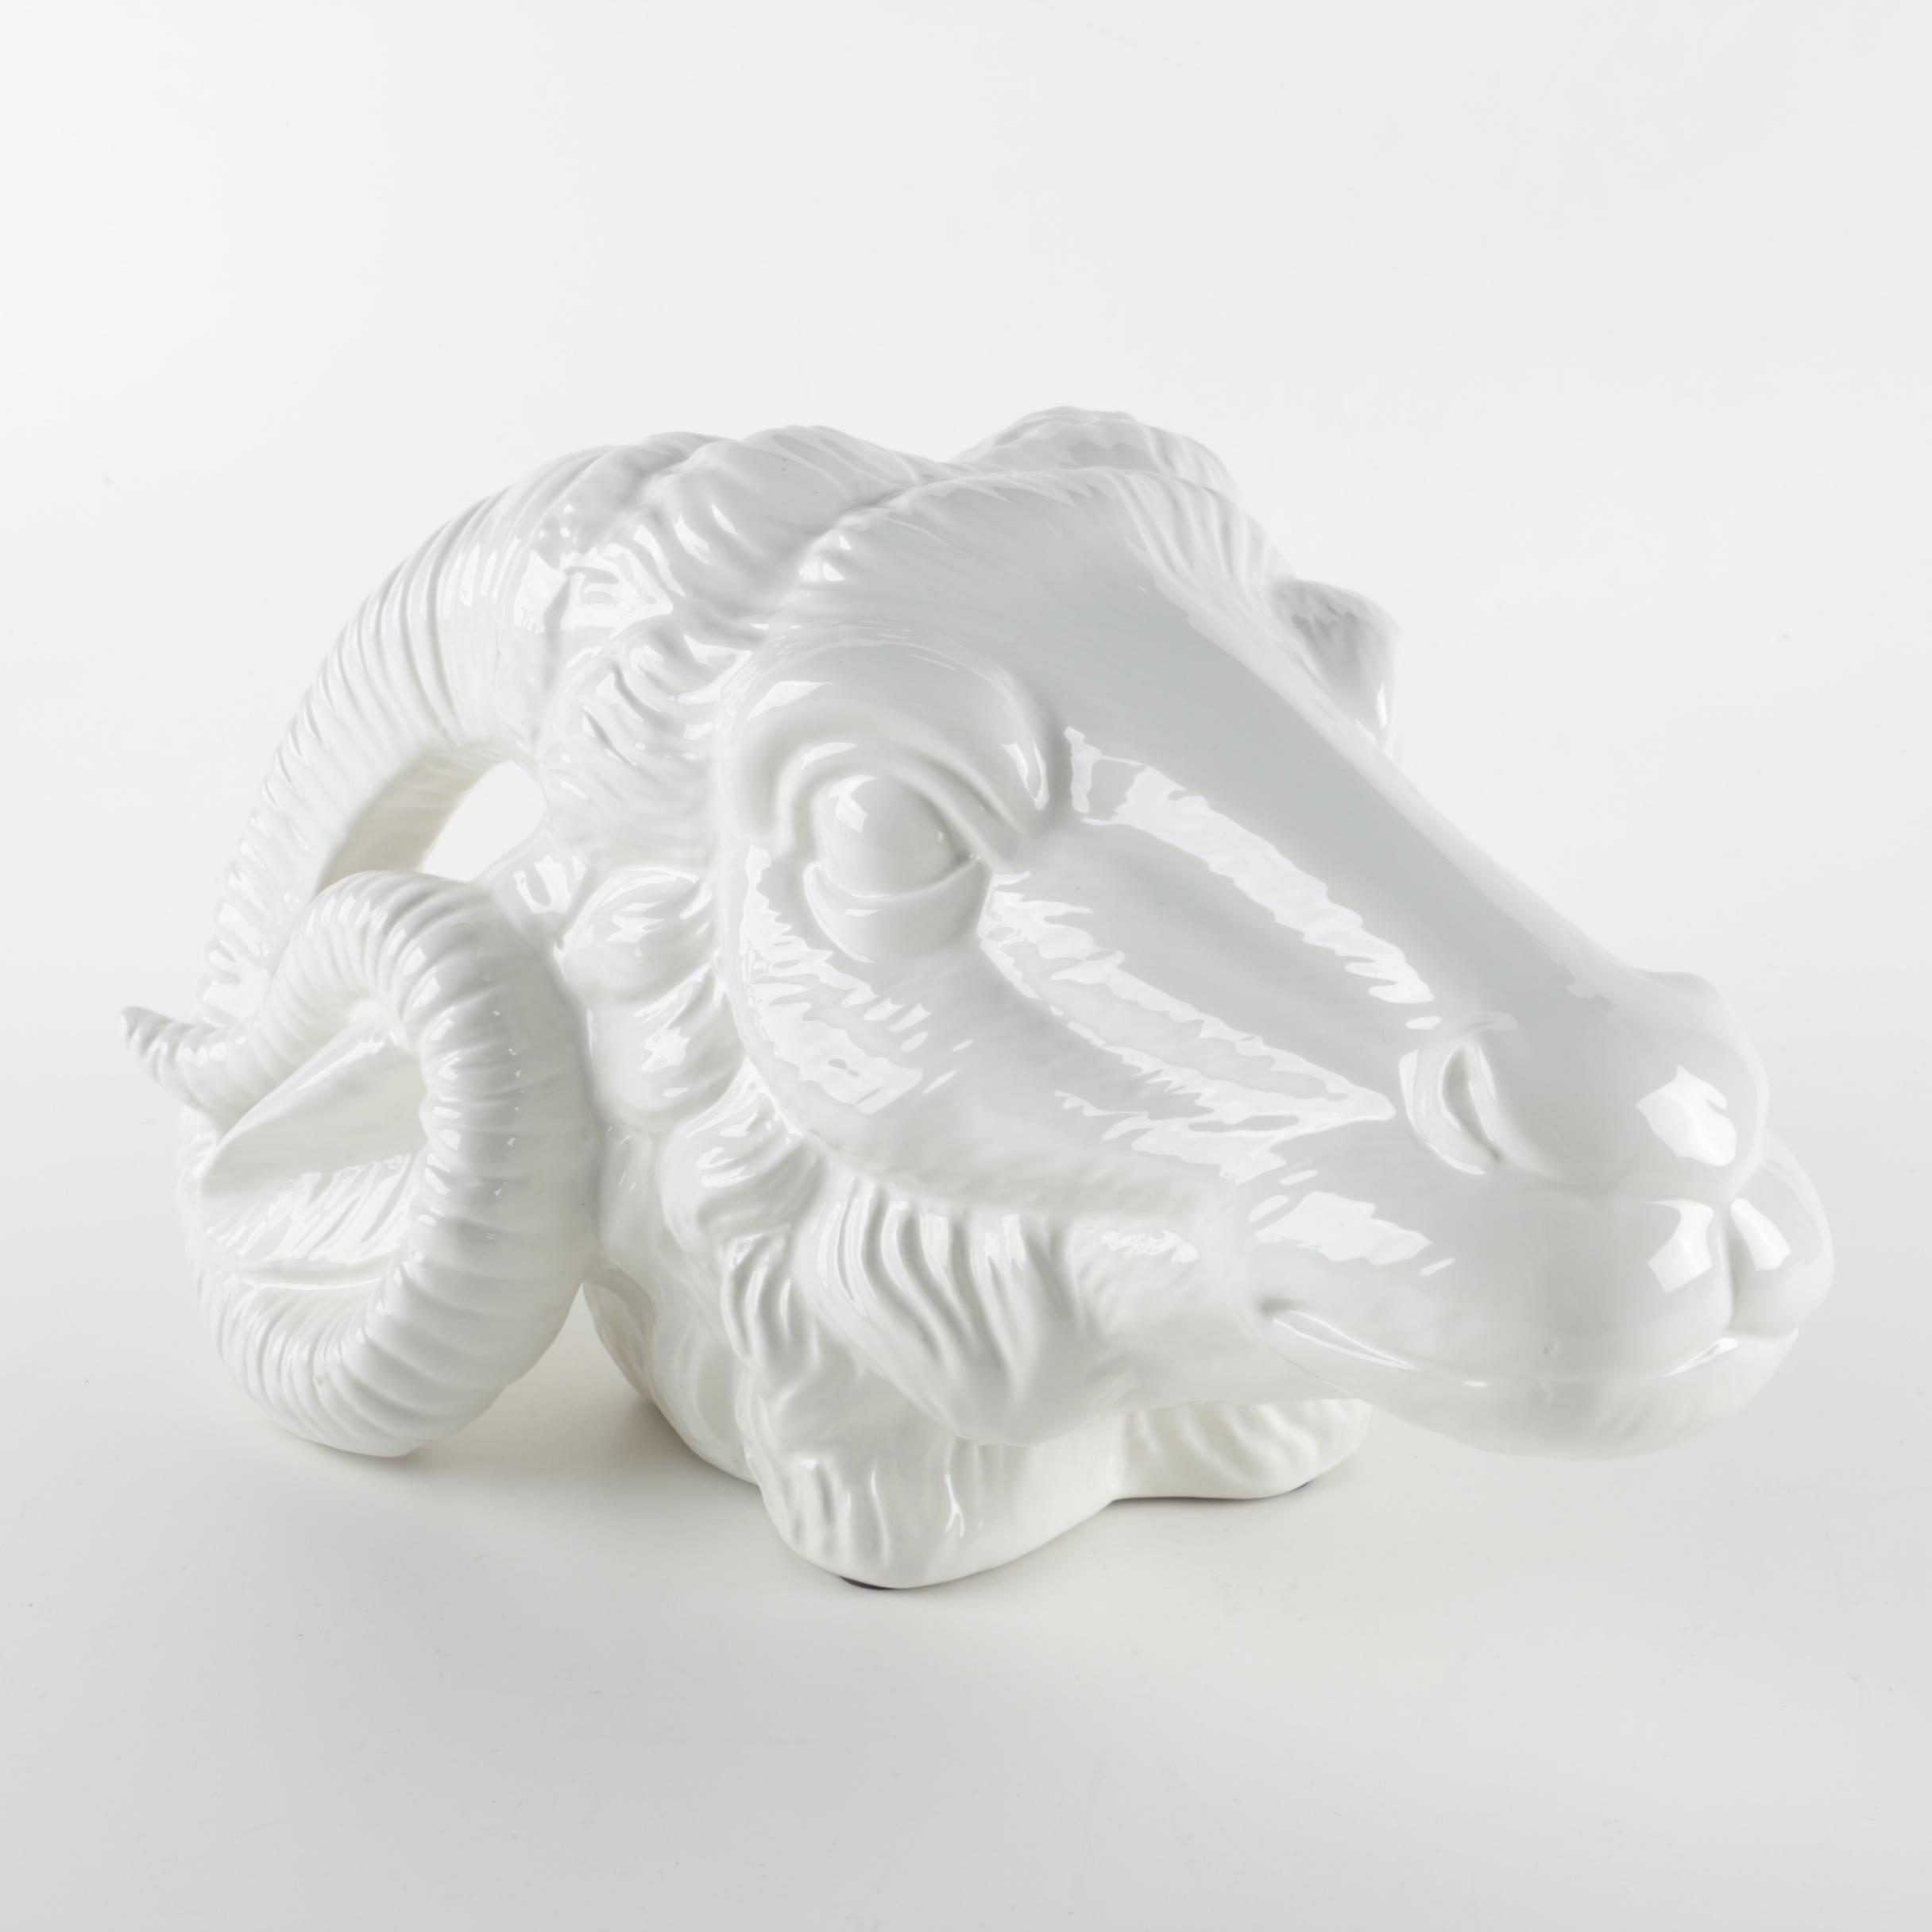 White Ceramic Goat Head Figurine